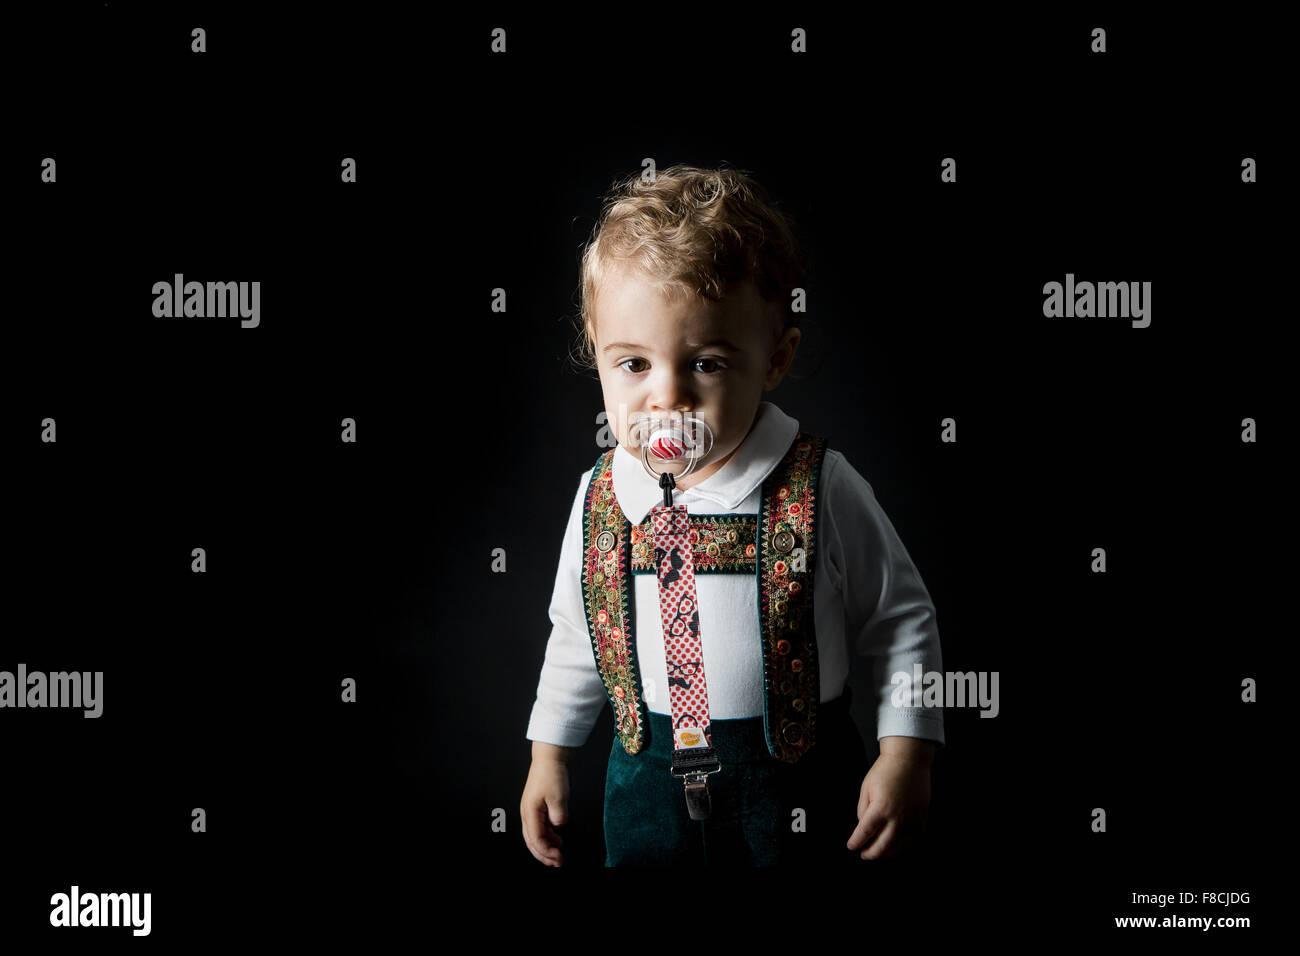 an 18 month young boy wearing lederhosen sucks on a pacifier - Stock Image